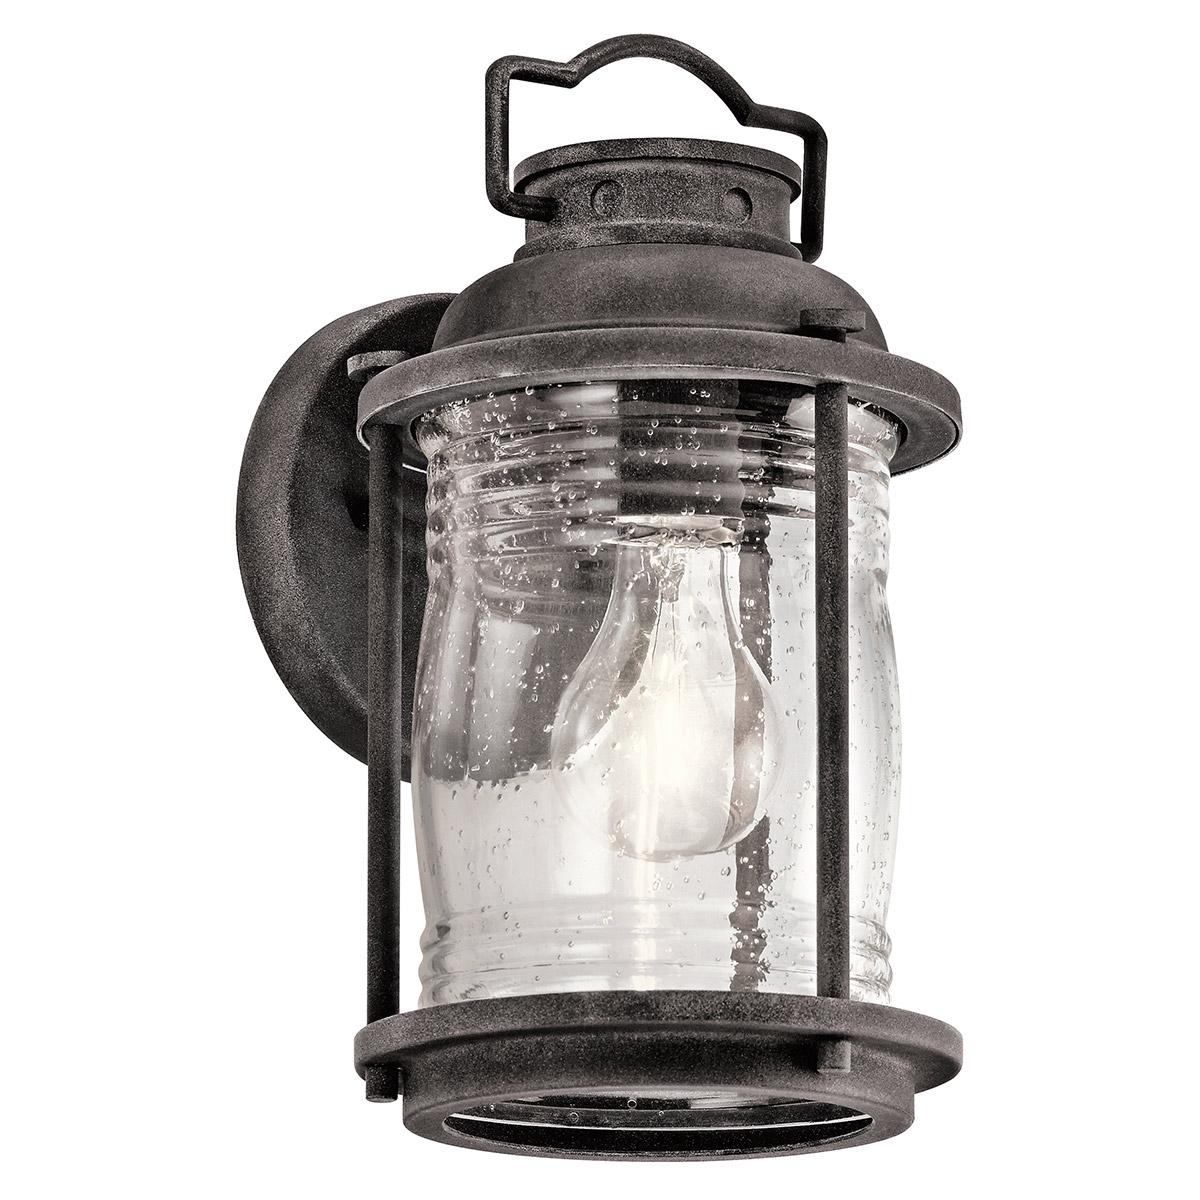 Ashland Pedestal Lantern In Weathered Zinc: Kichler Lighting 49569WZC Ashland Bay Outdoor Wall Lights